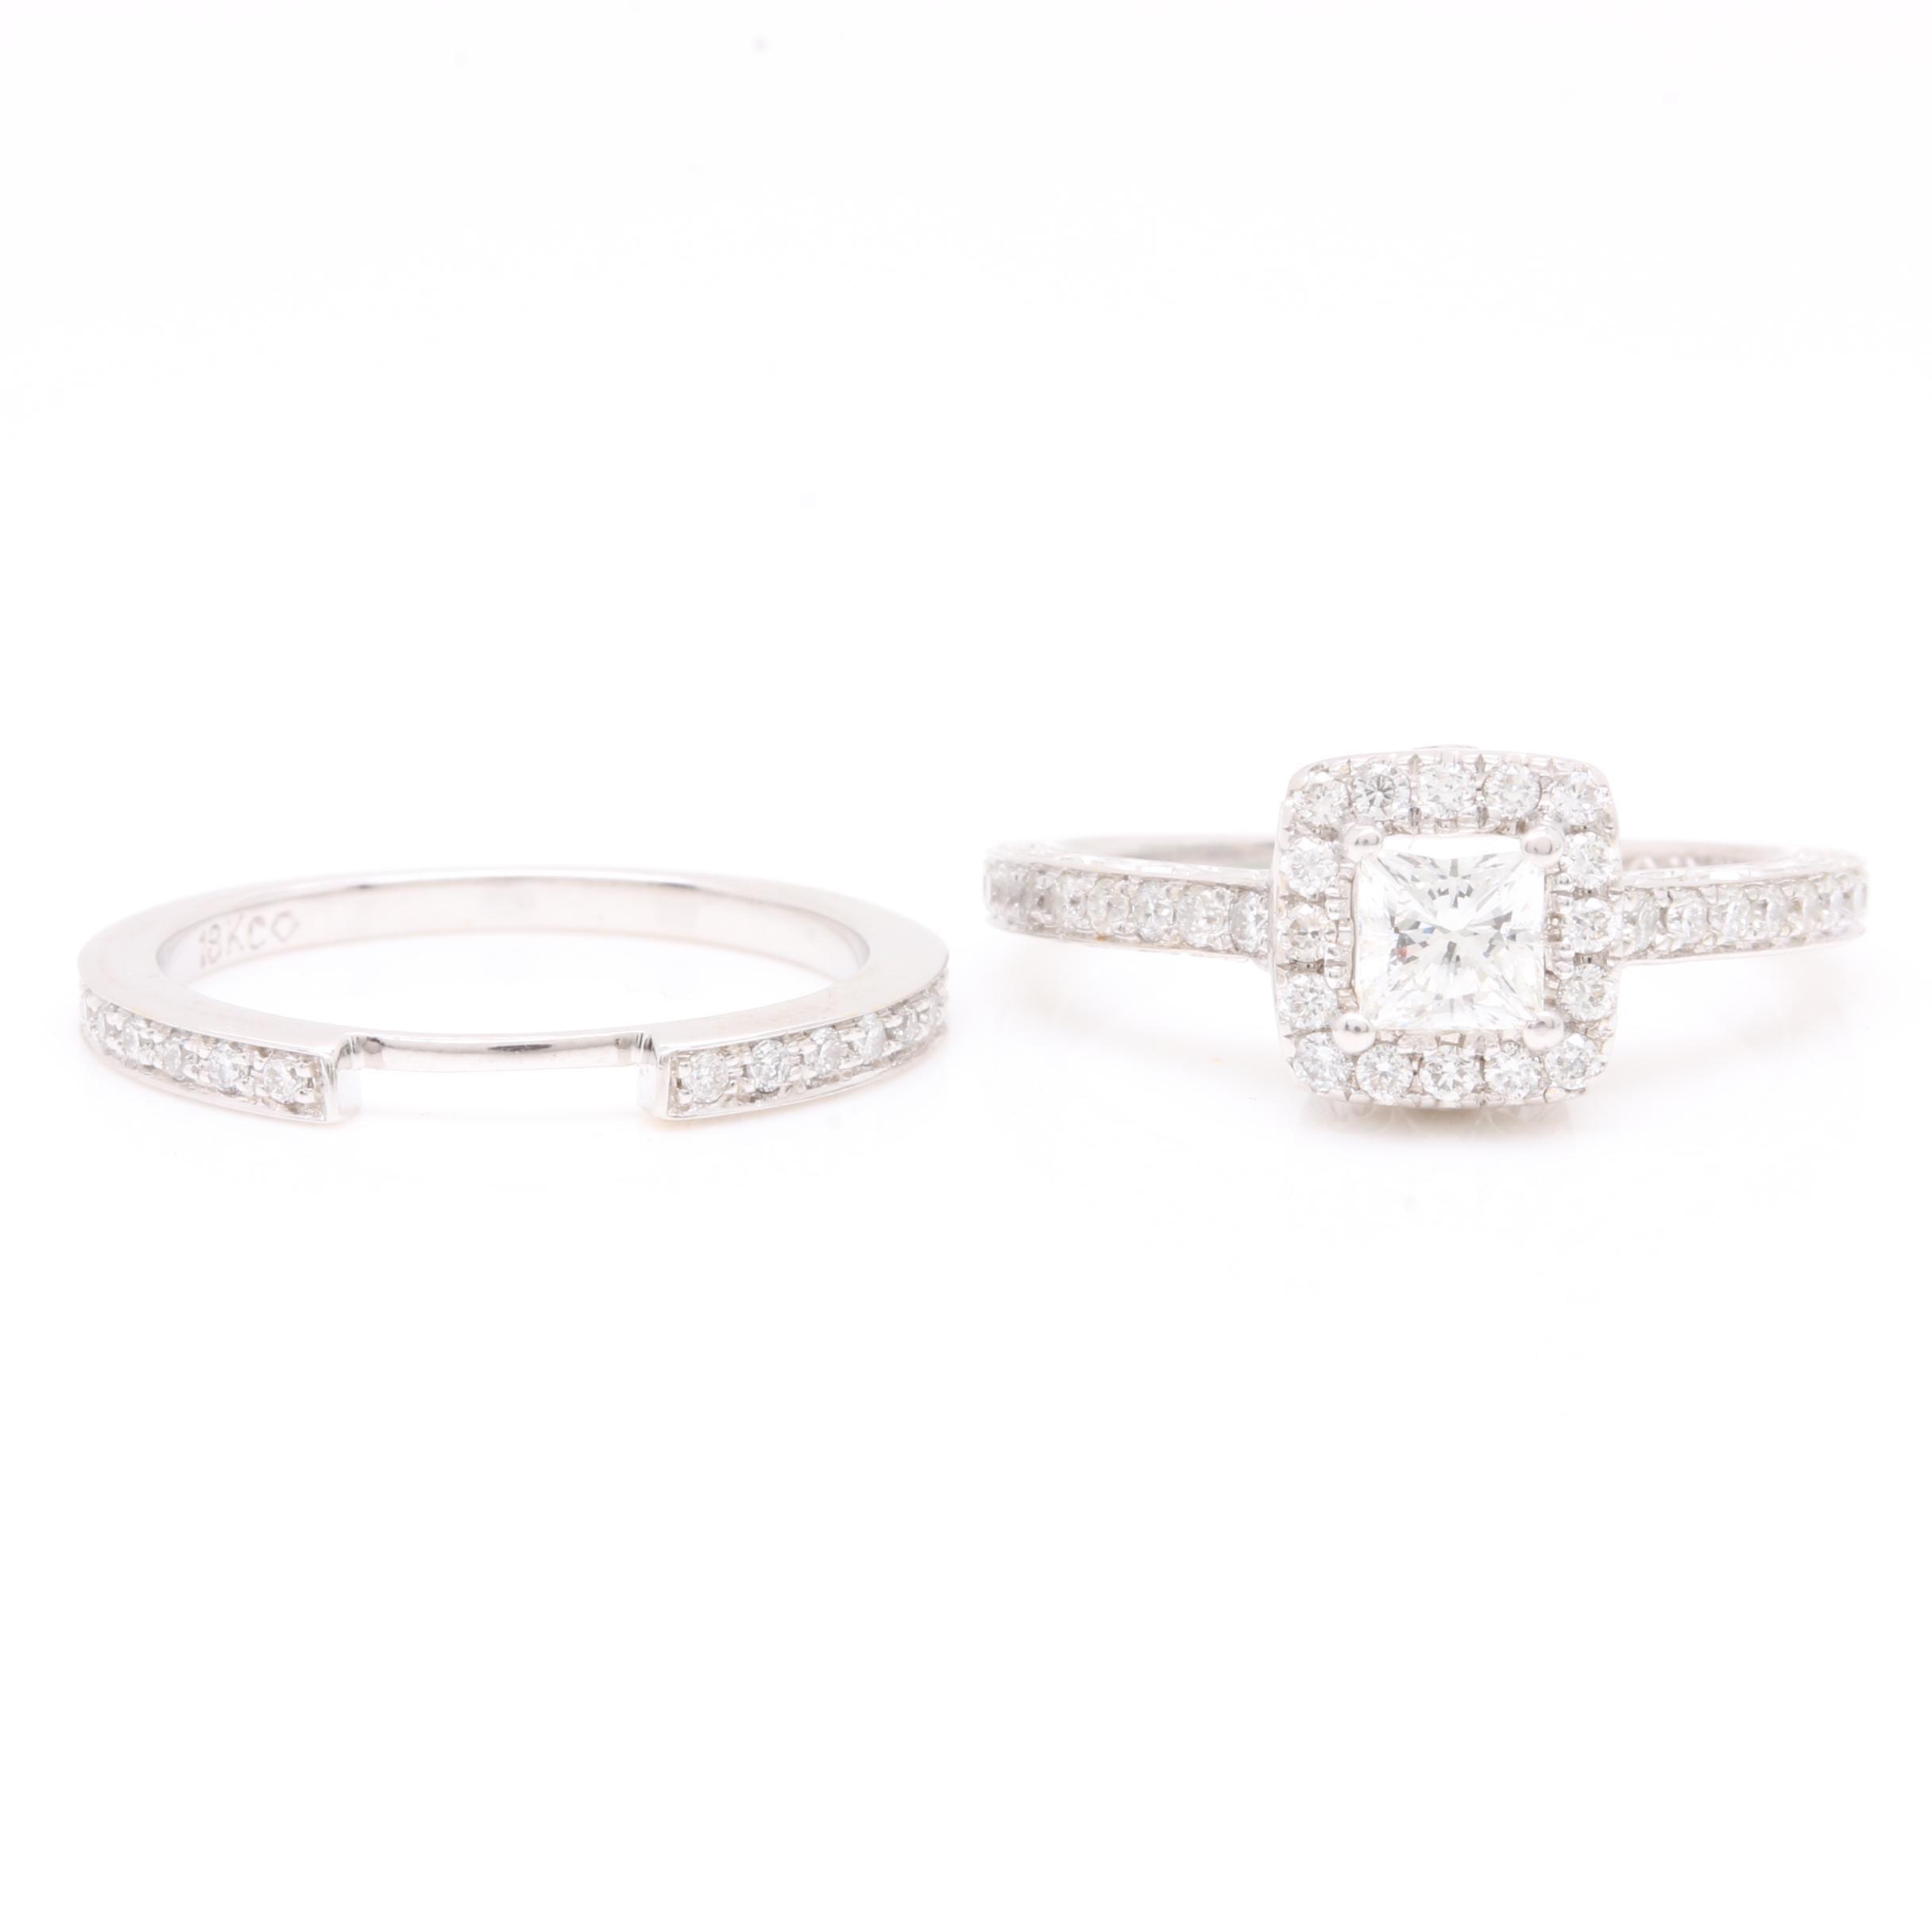 18K White Gold 1.02 CTW Diamond Ring Set